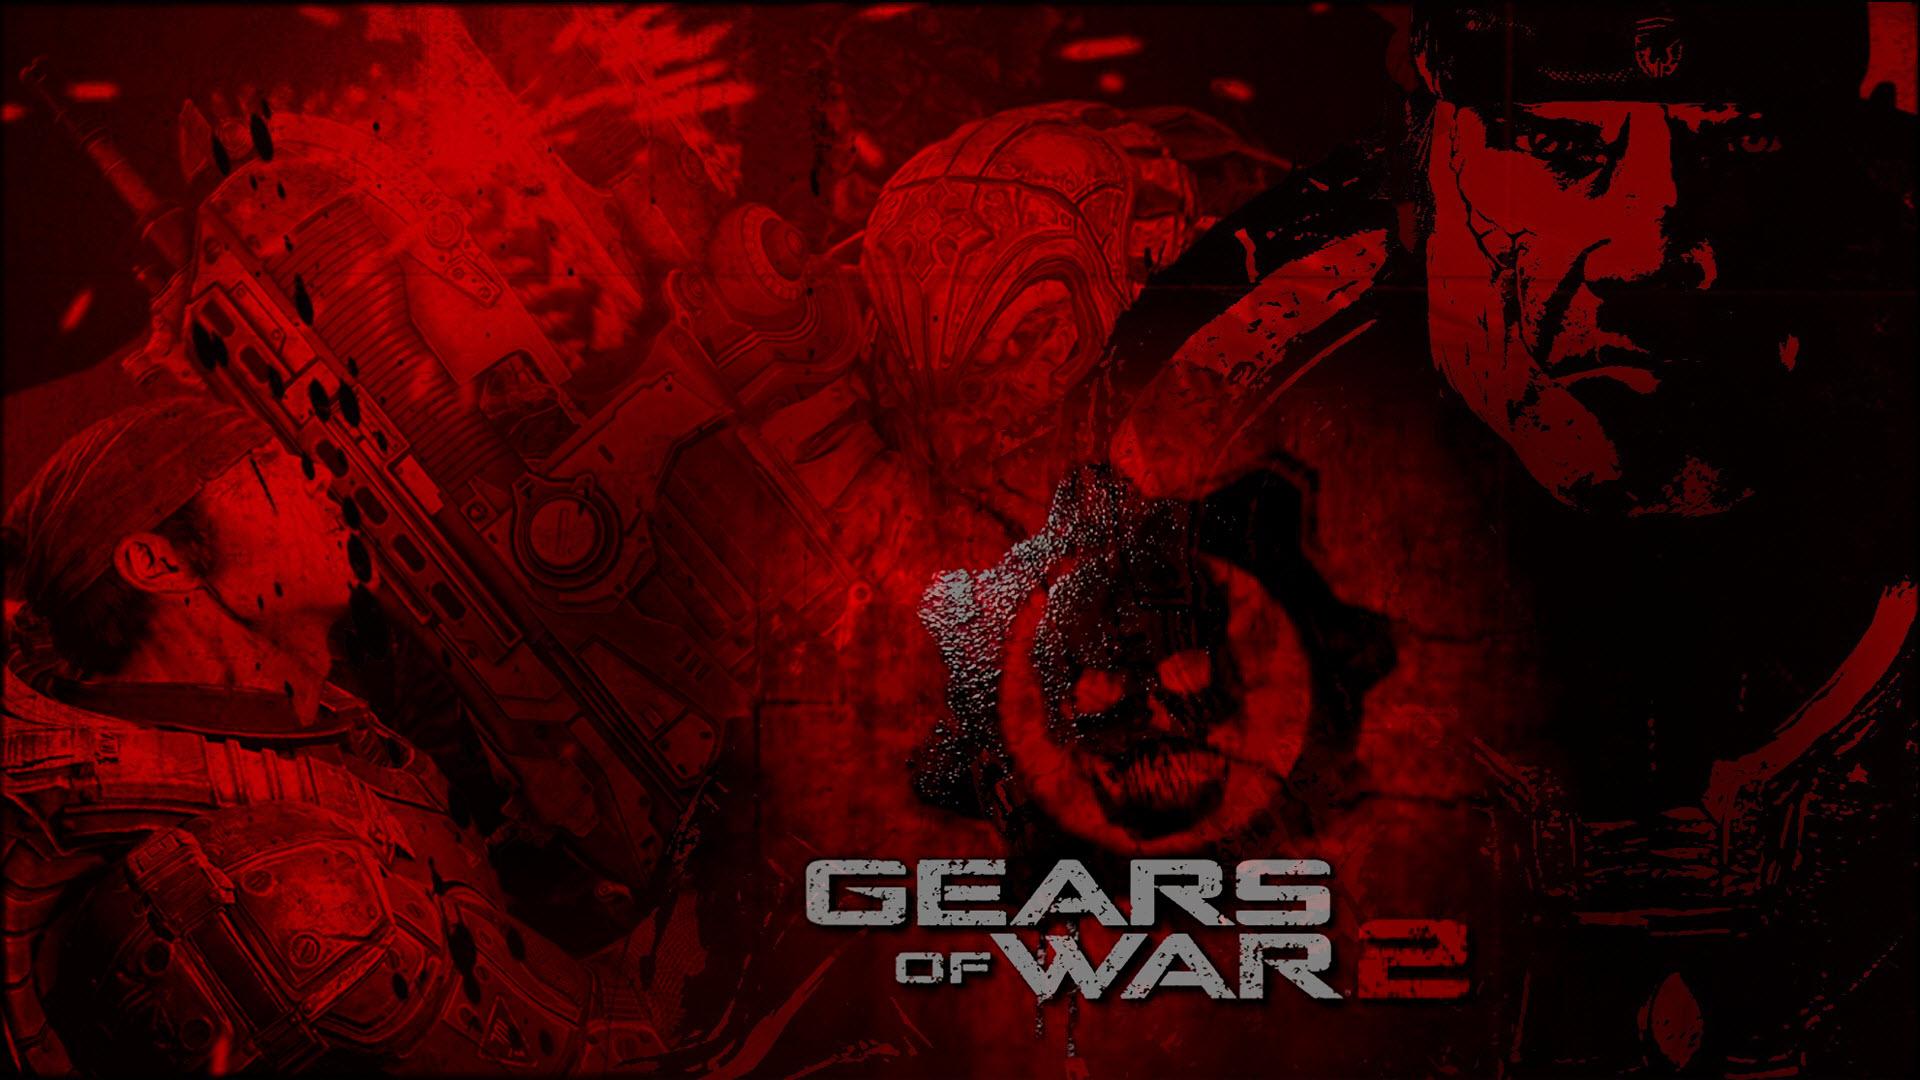 hdwallpapersinwallsgears of war 2 game HDjpg 1920x1080